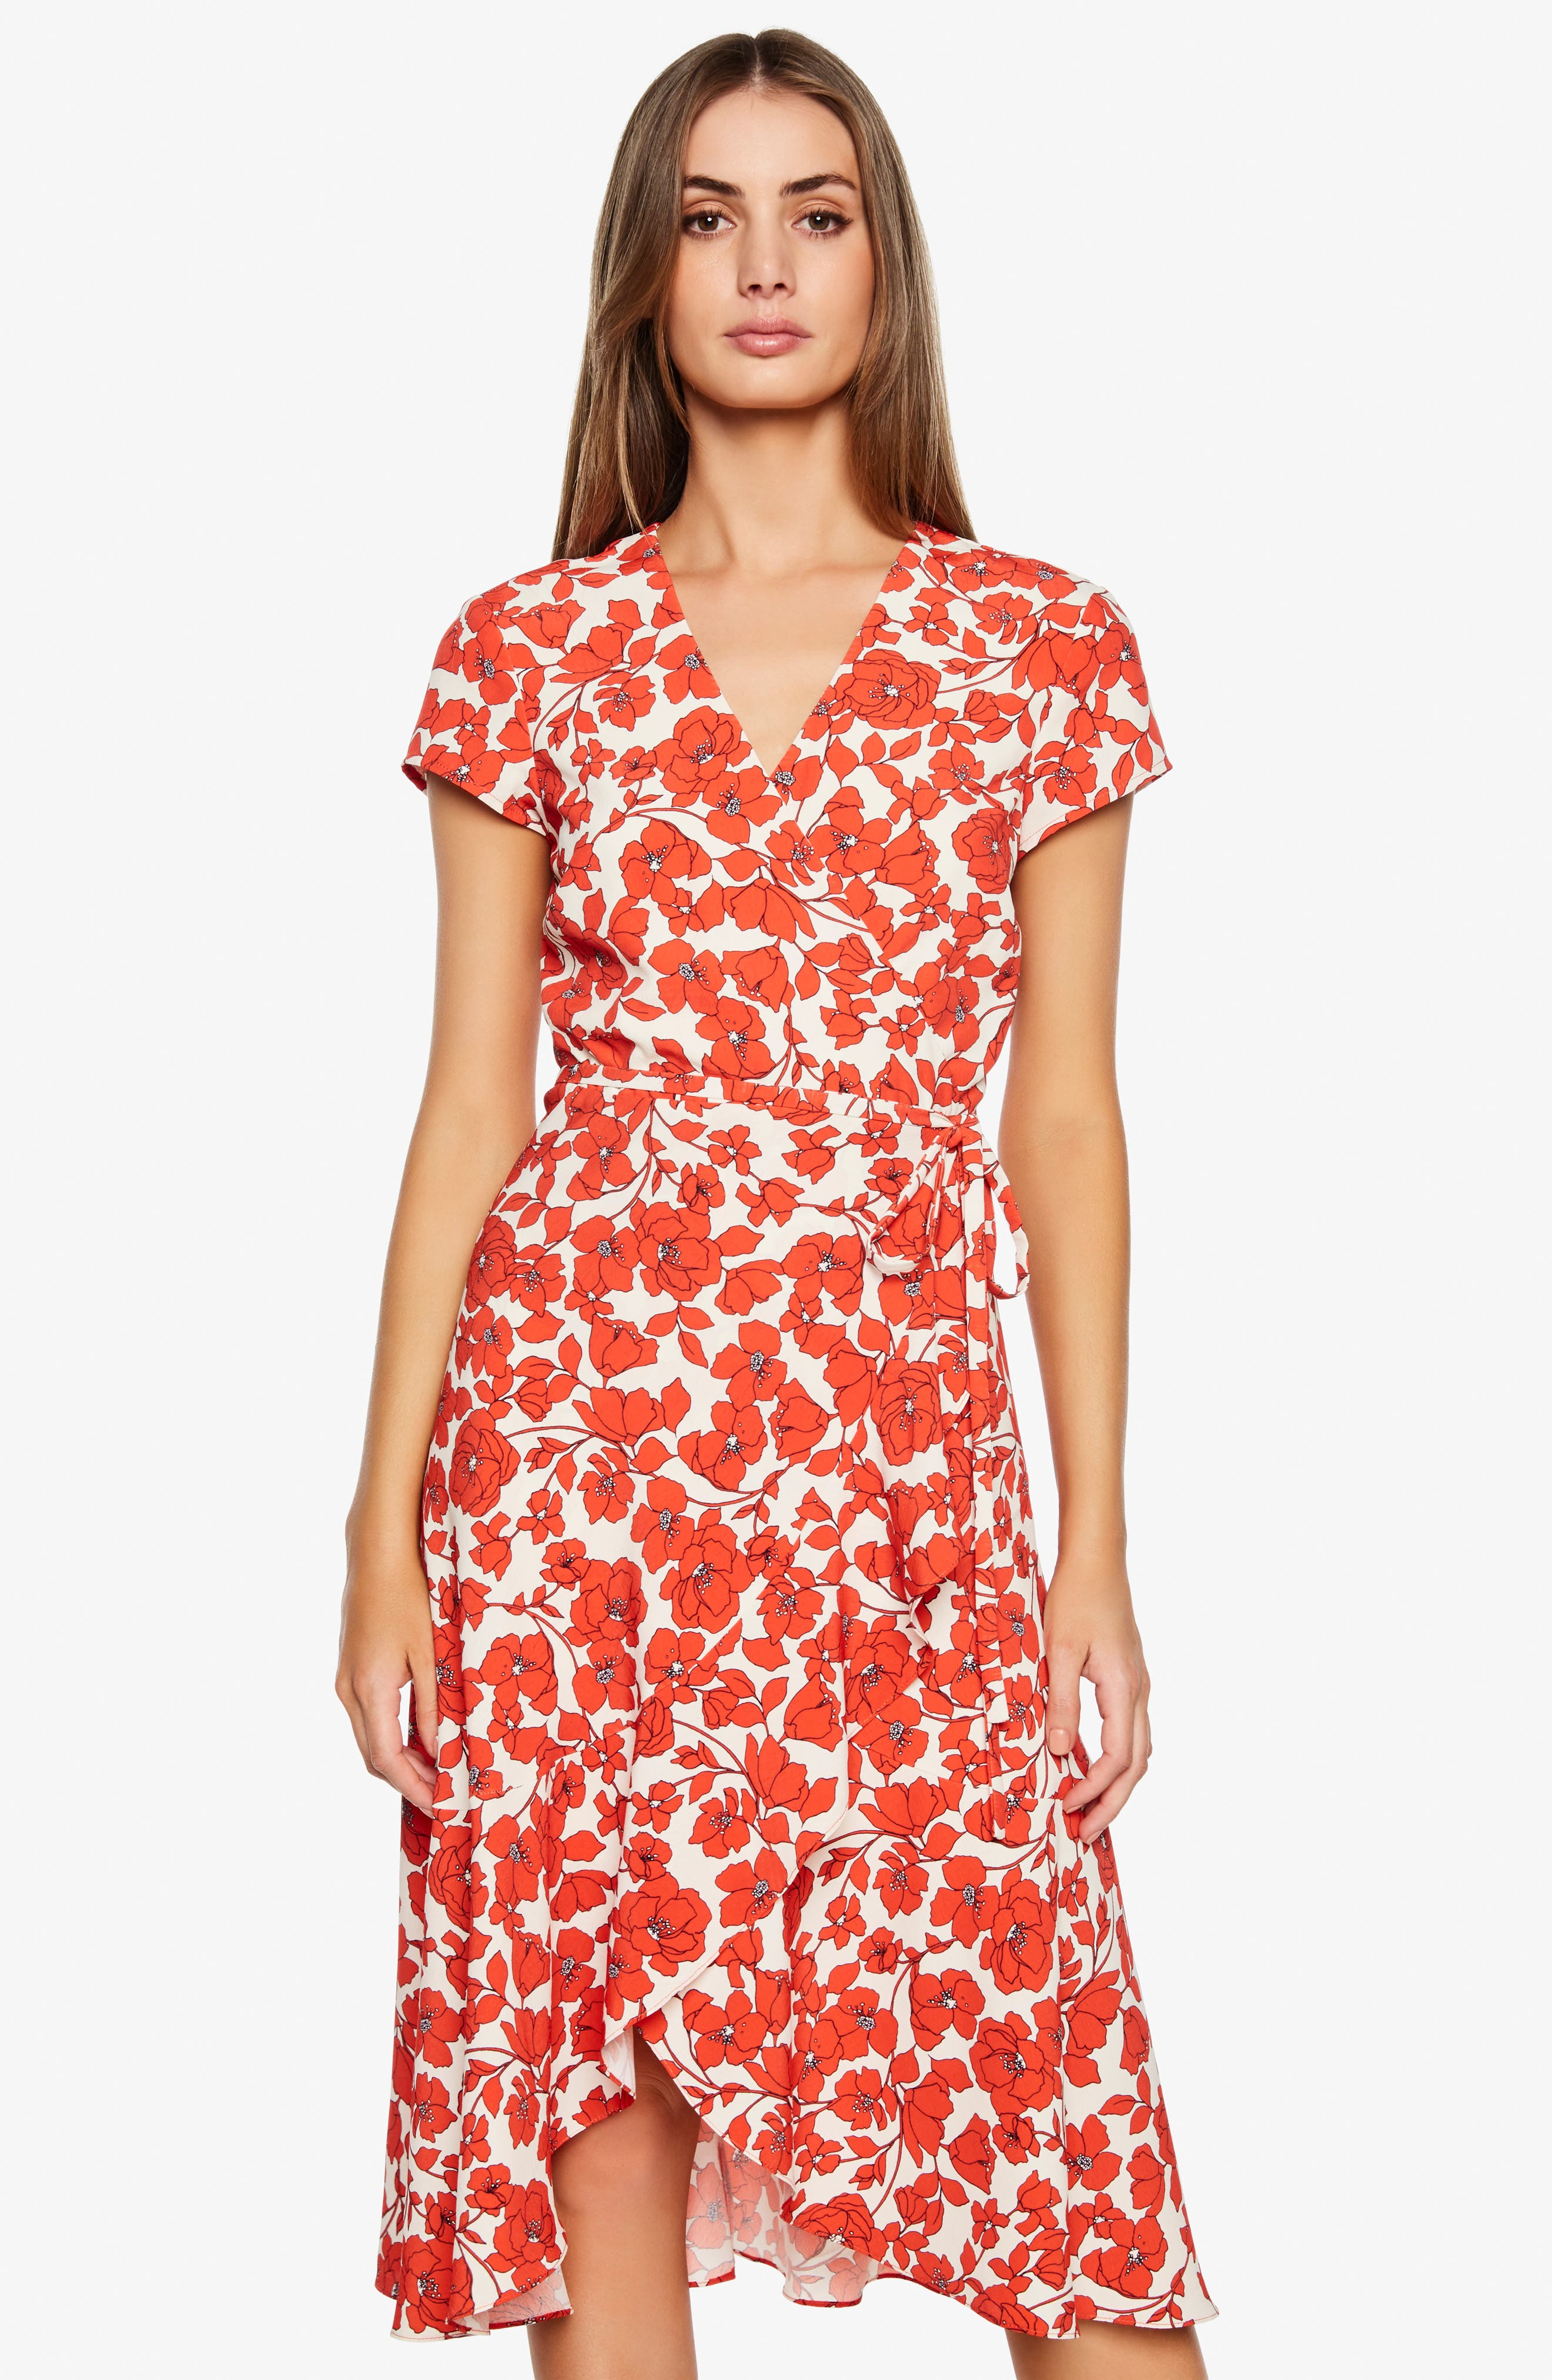 BARDOT, Fiesta Floral Midi Dress, Alternate thumbnail 7, color, 800